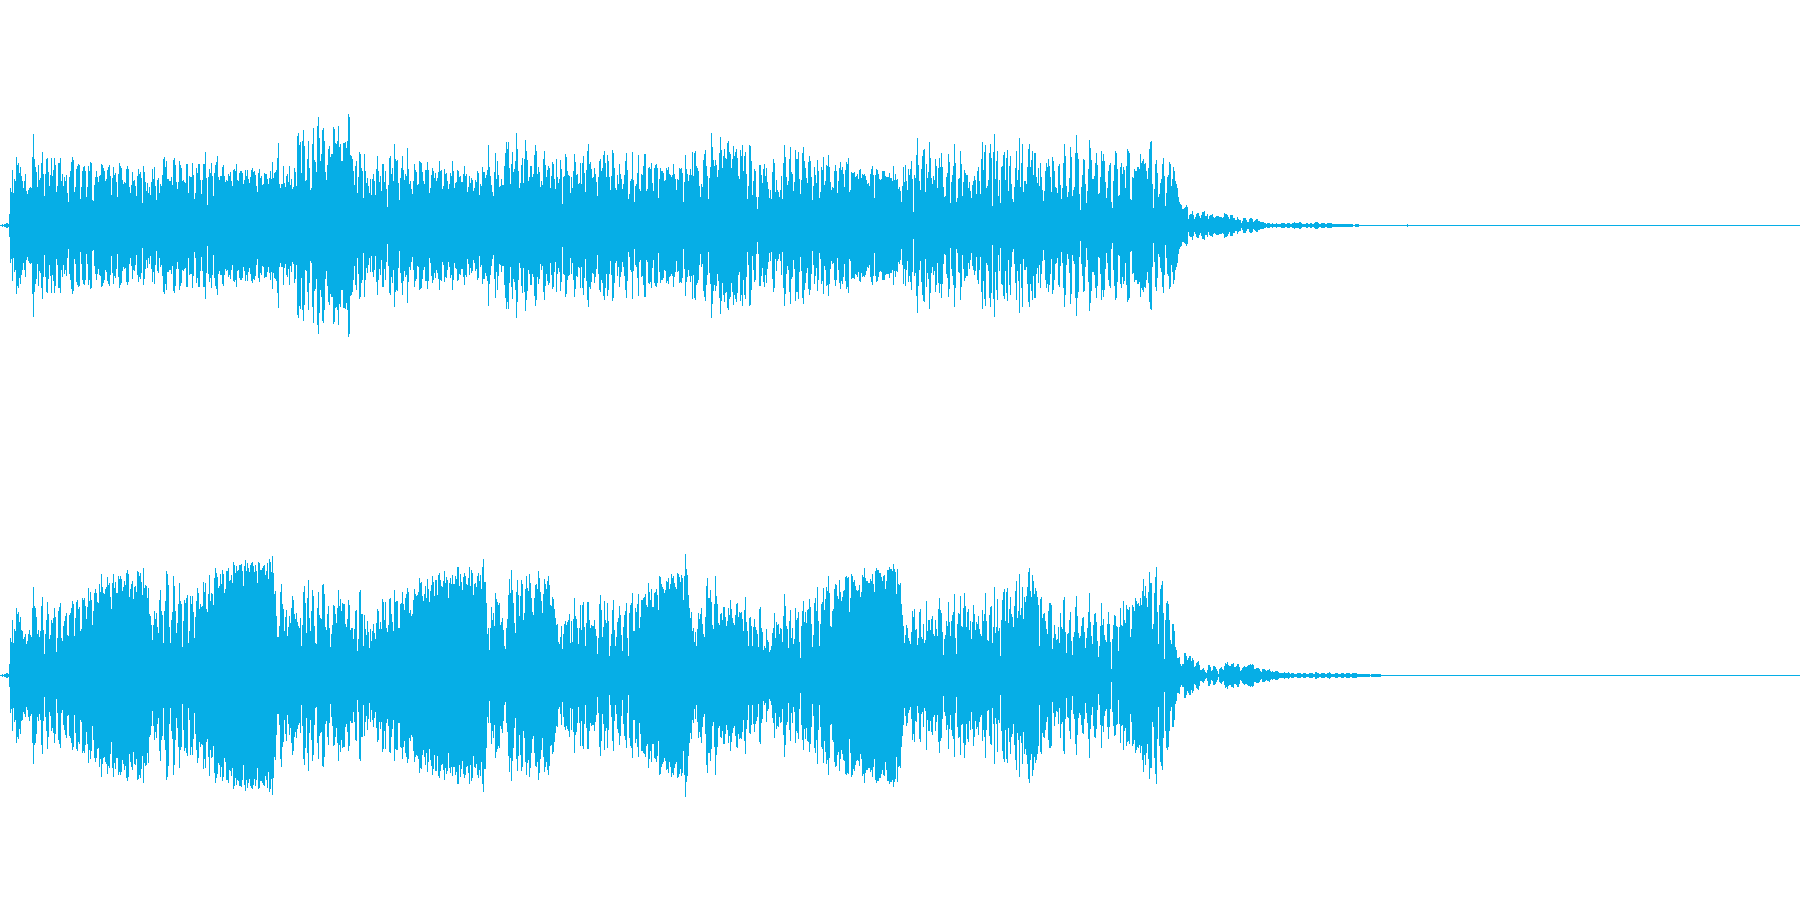 Guitarジングル8/BADBOYの再生済みの波形